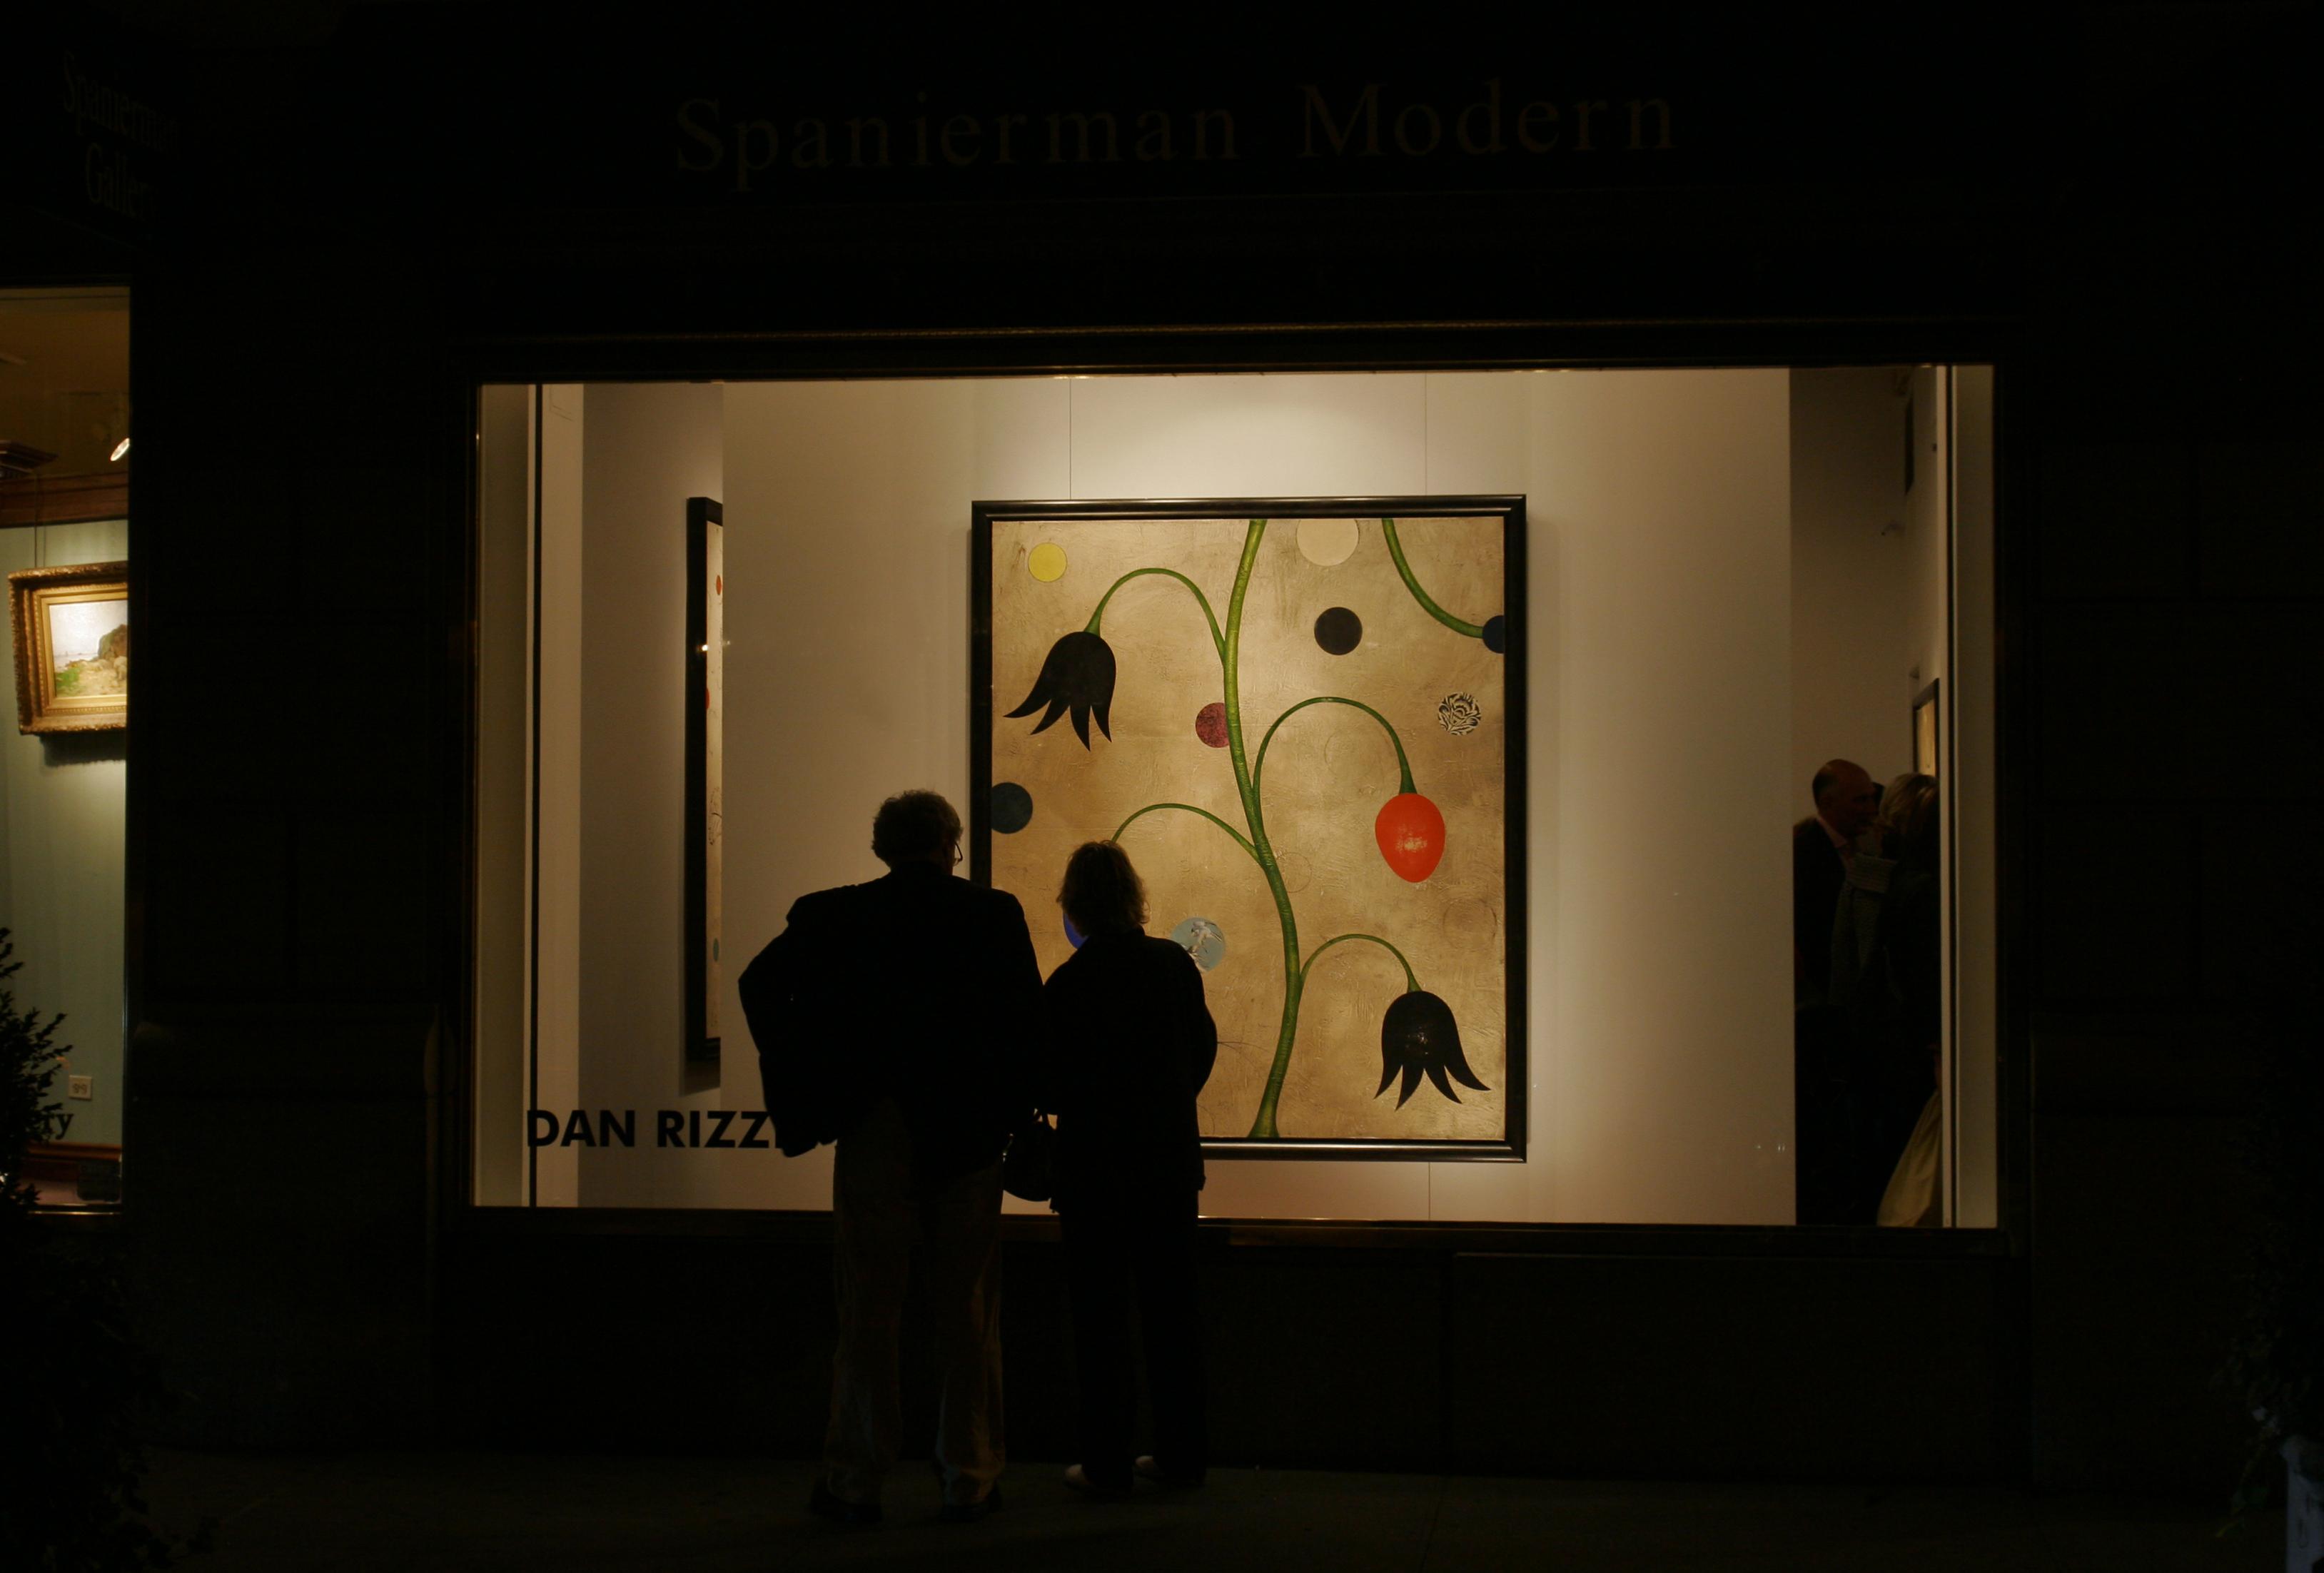 Spanierman Modern Gallery hosting Dan Rizzie art